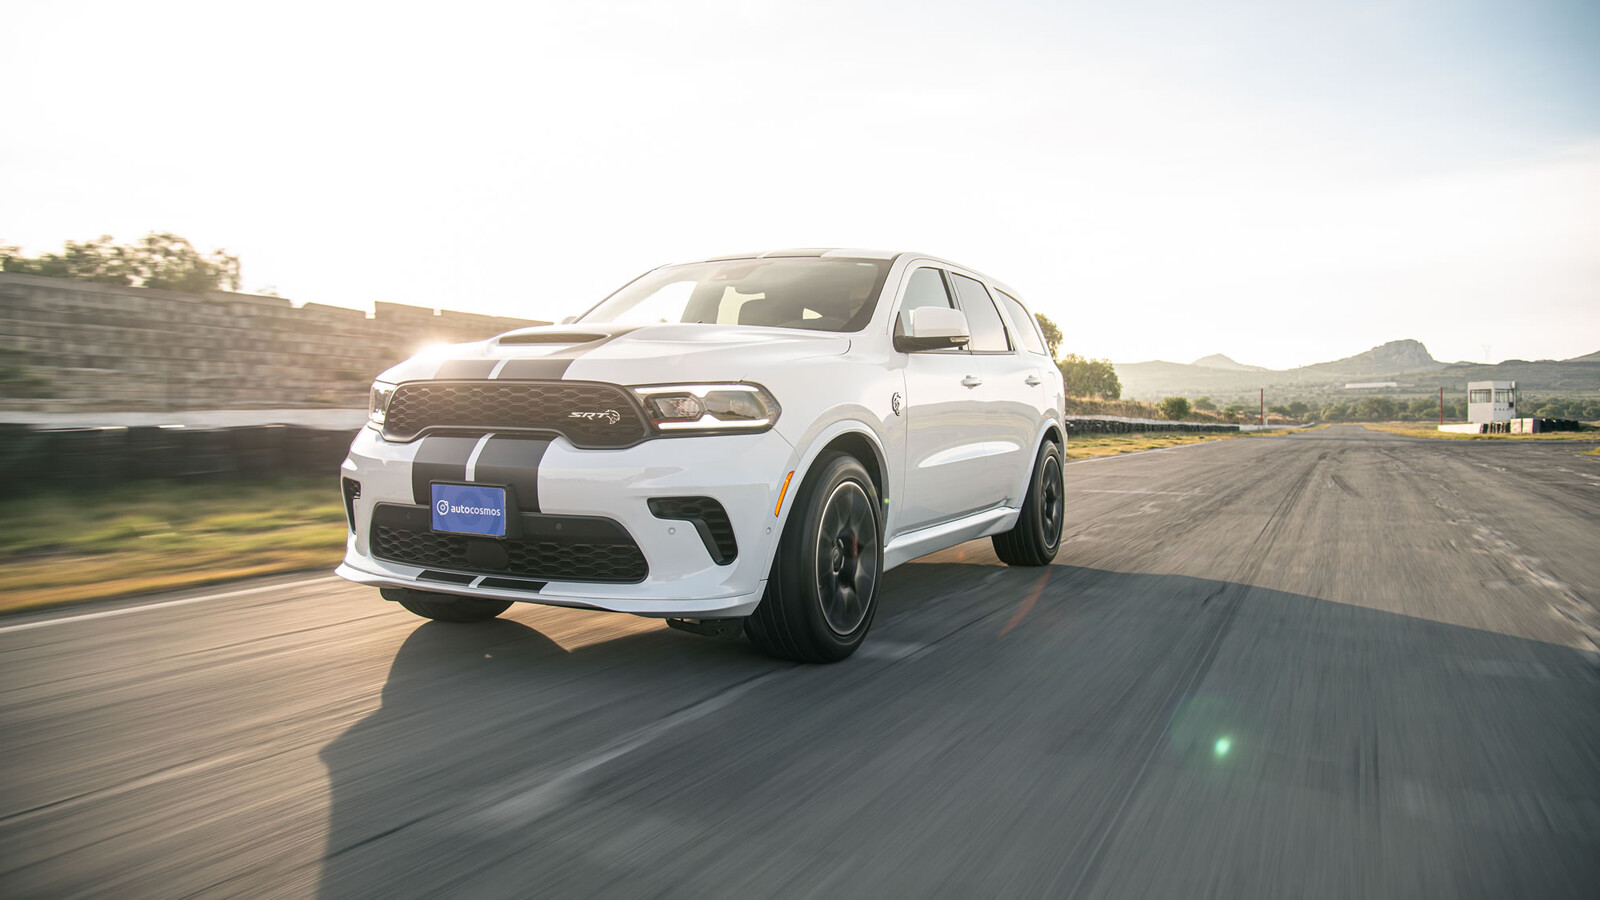 Dodge Durango SRT Hellcat a prueba, una despedida exclusiva y brutal